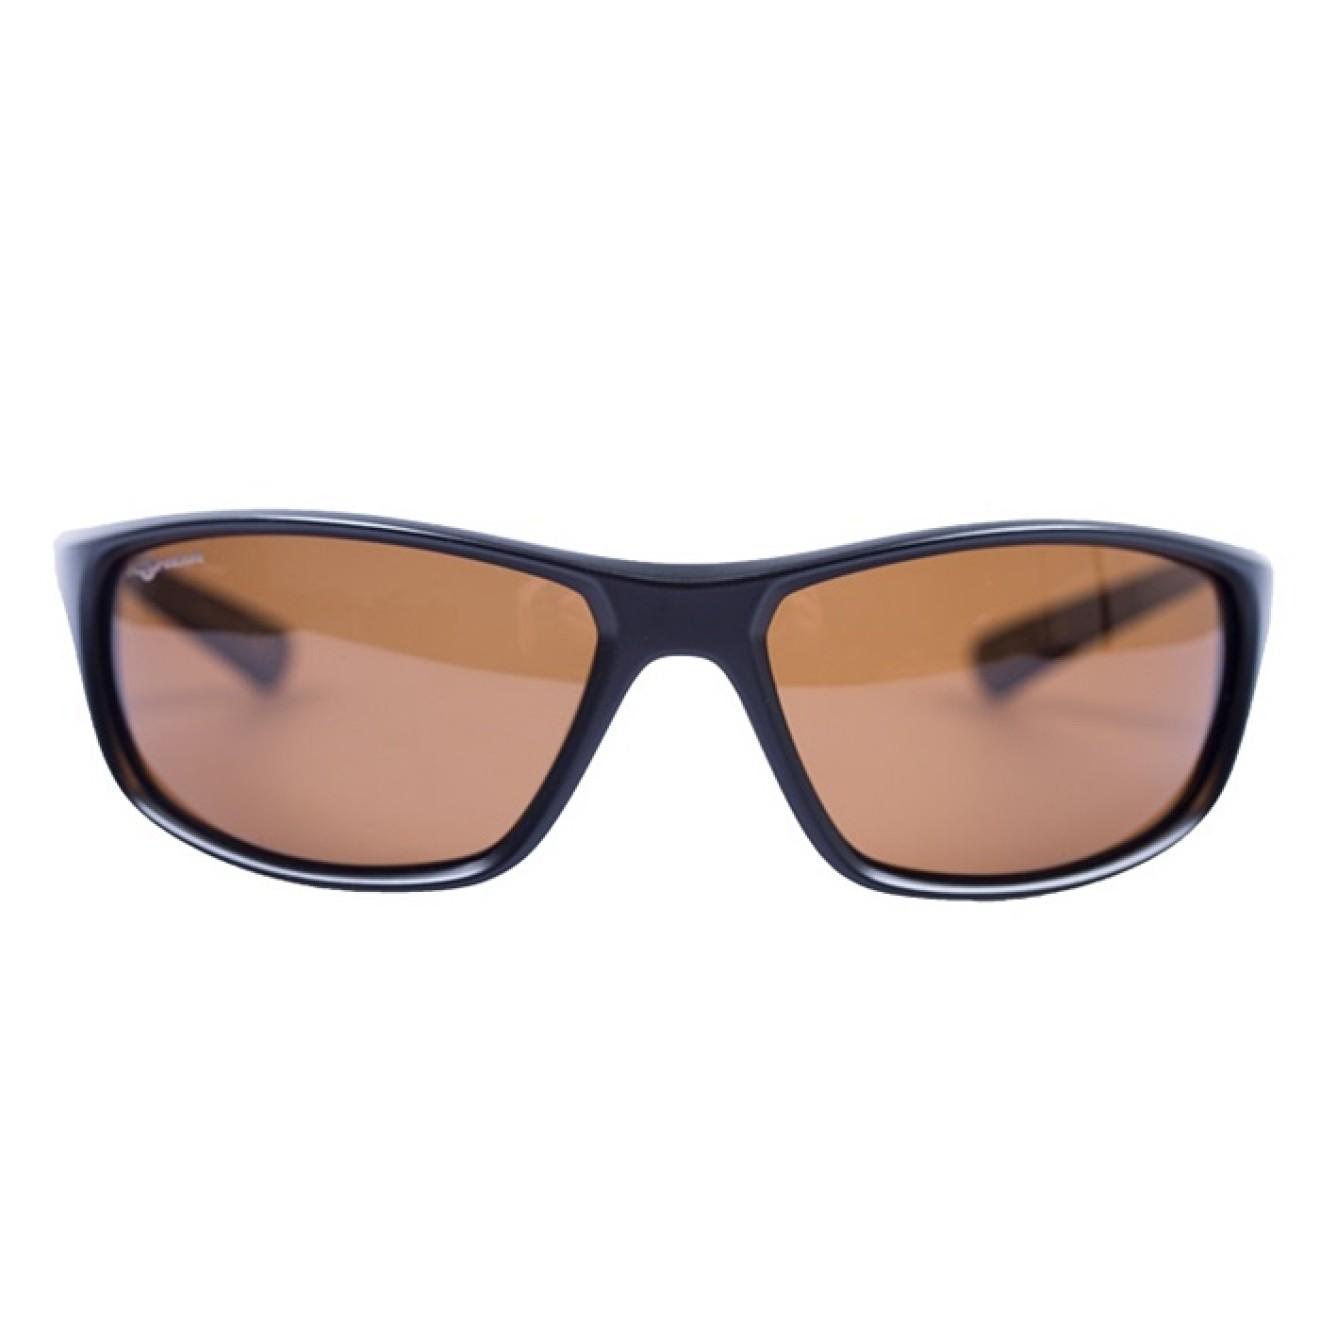 a3b6fed24fe Korda - Wraps Sunglasses Gloss Black Brown Lense